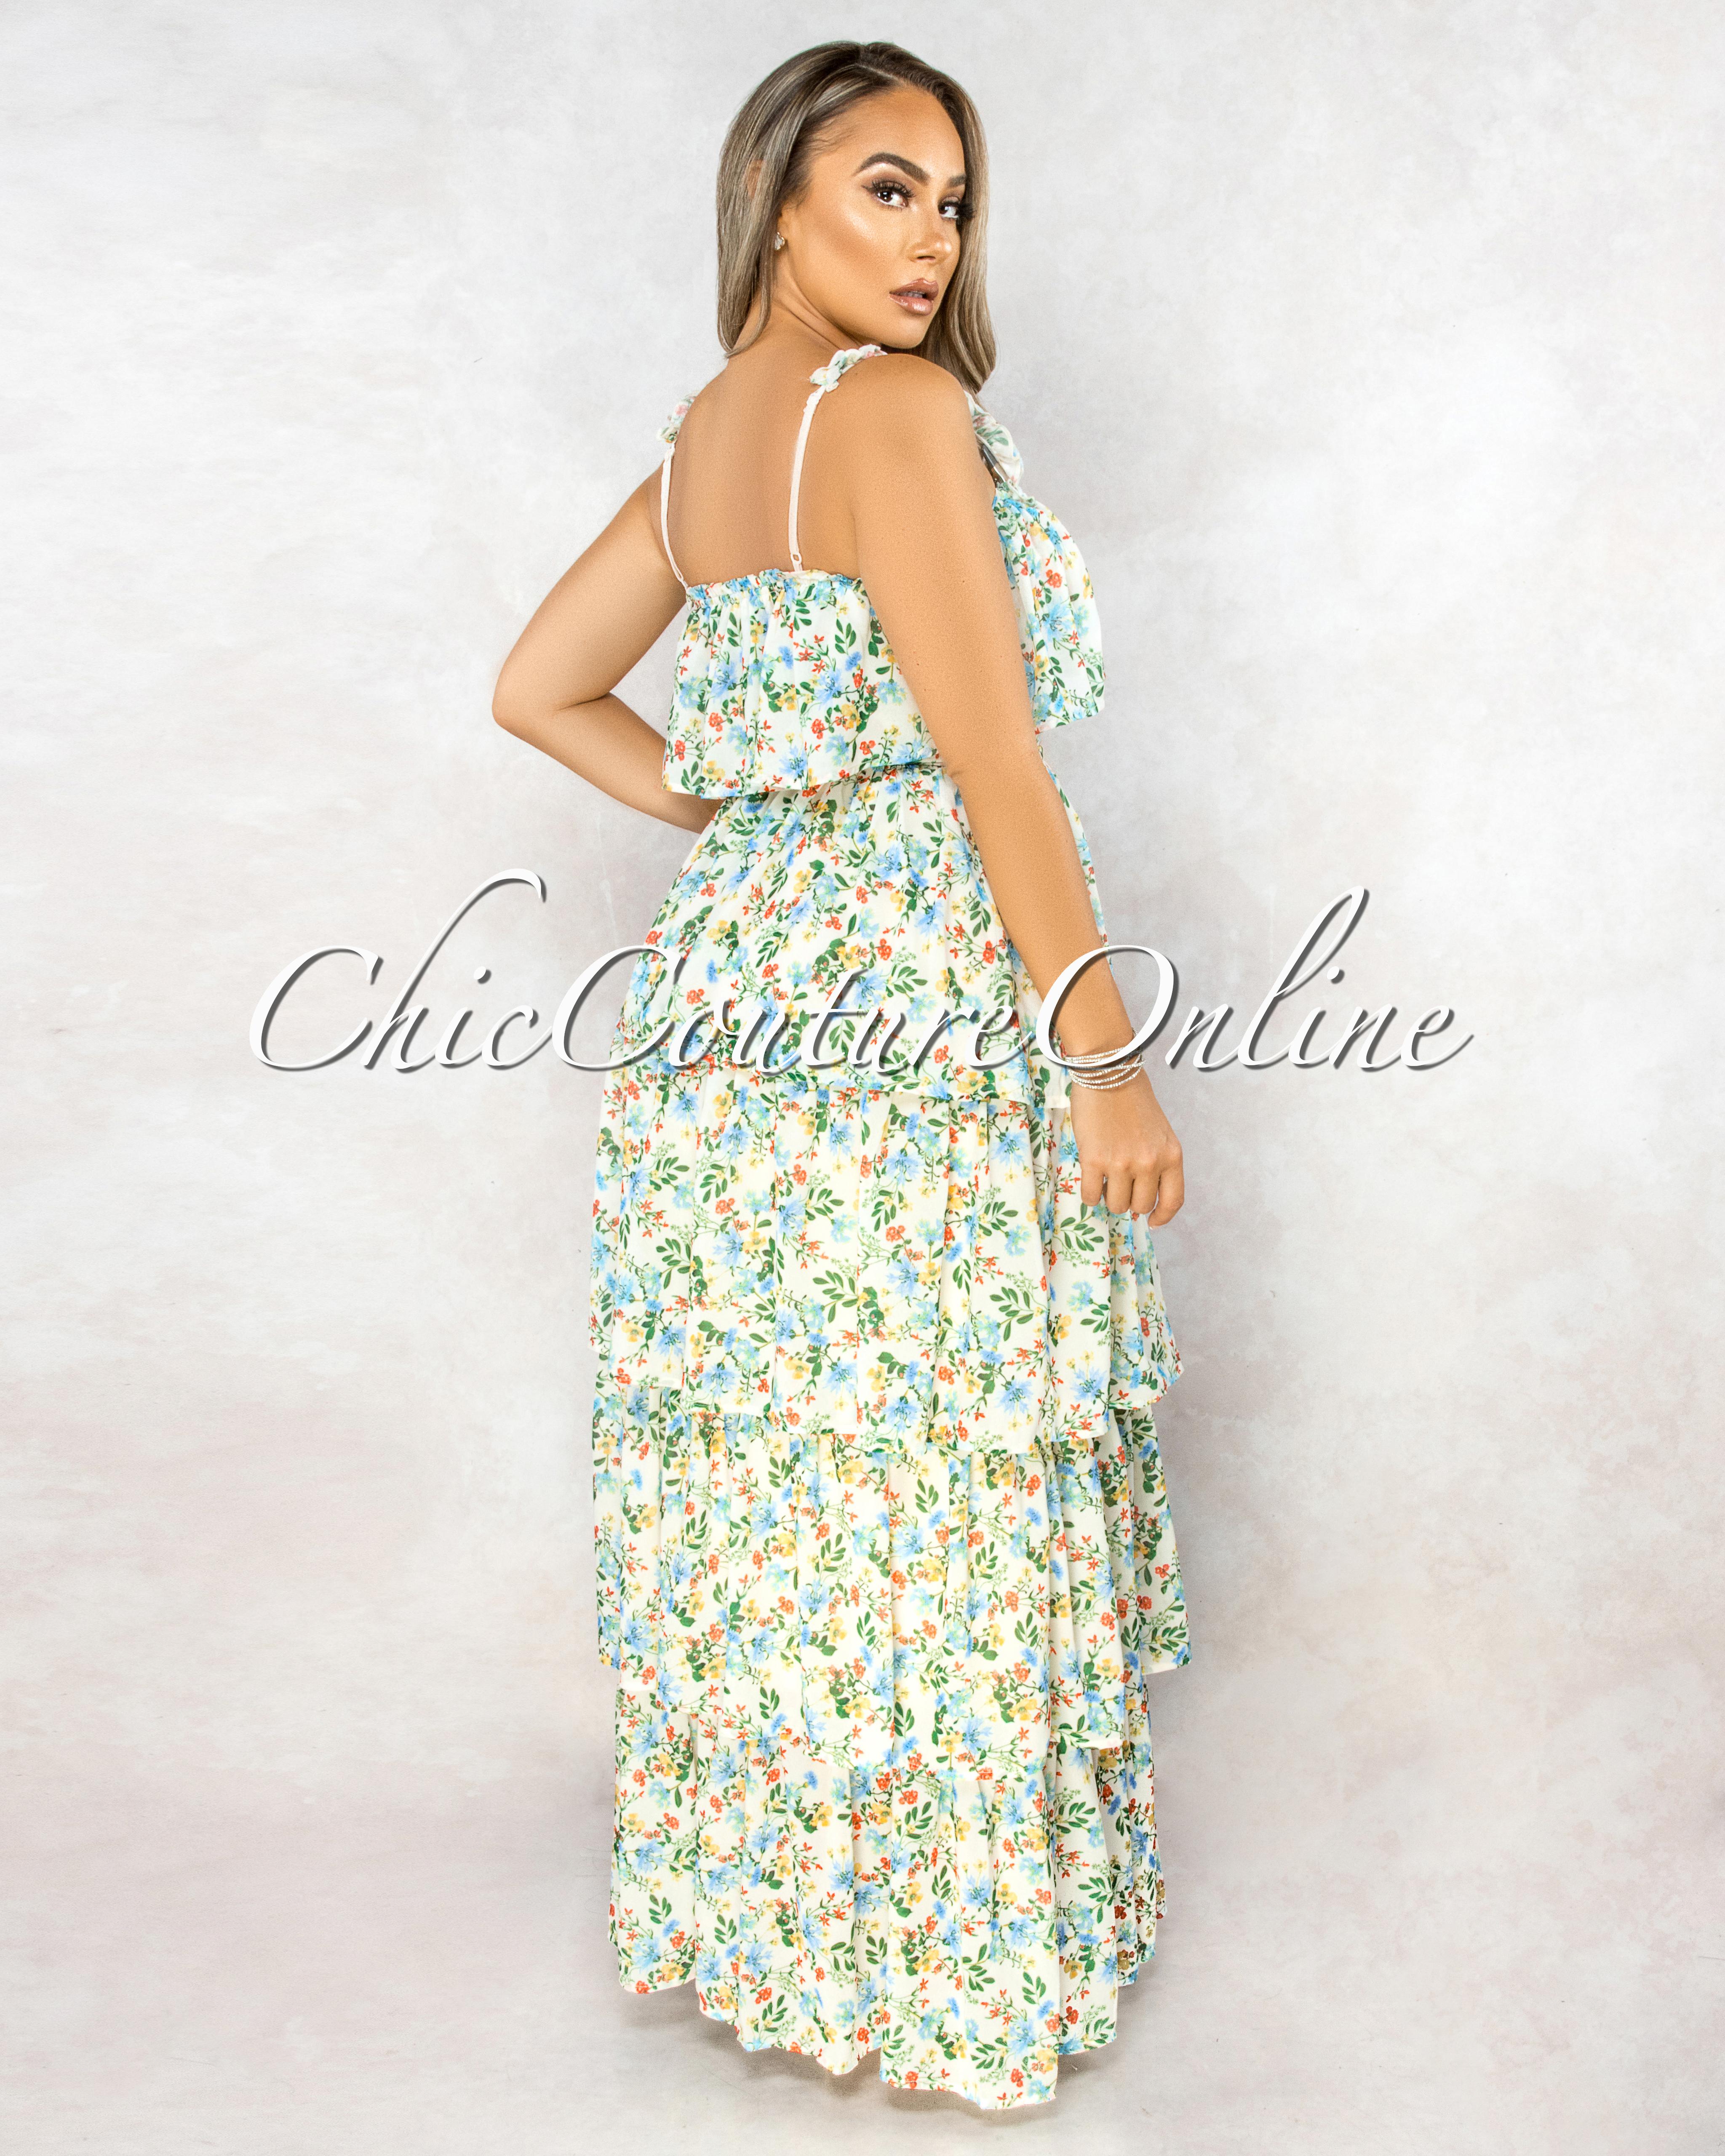 Vimala Ivory Multi-Color Floral Print Ruffle Tier Maxi Dress